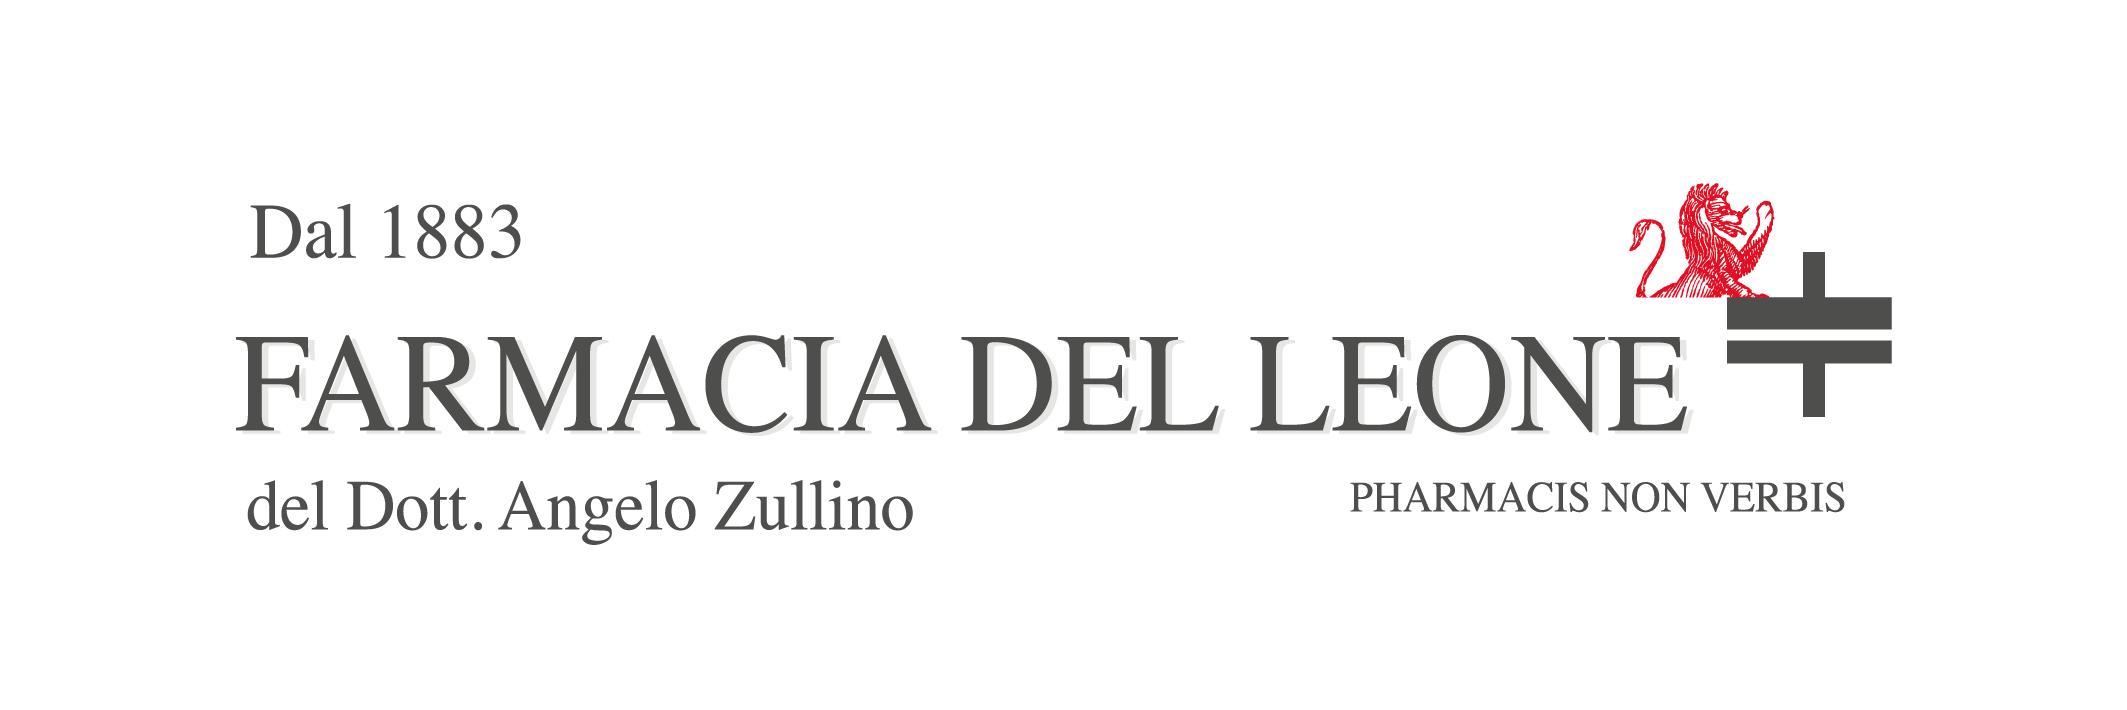 zullino-01